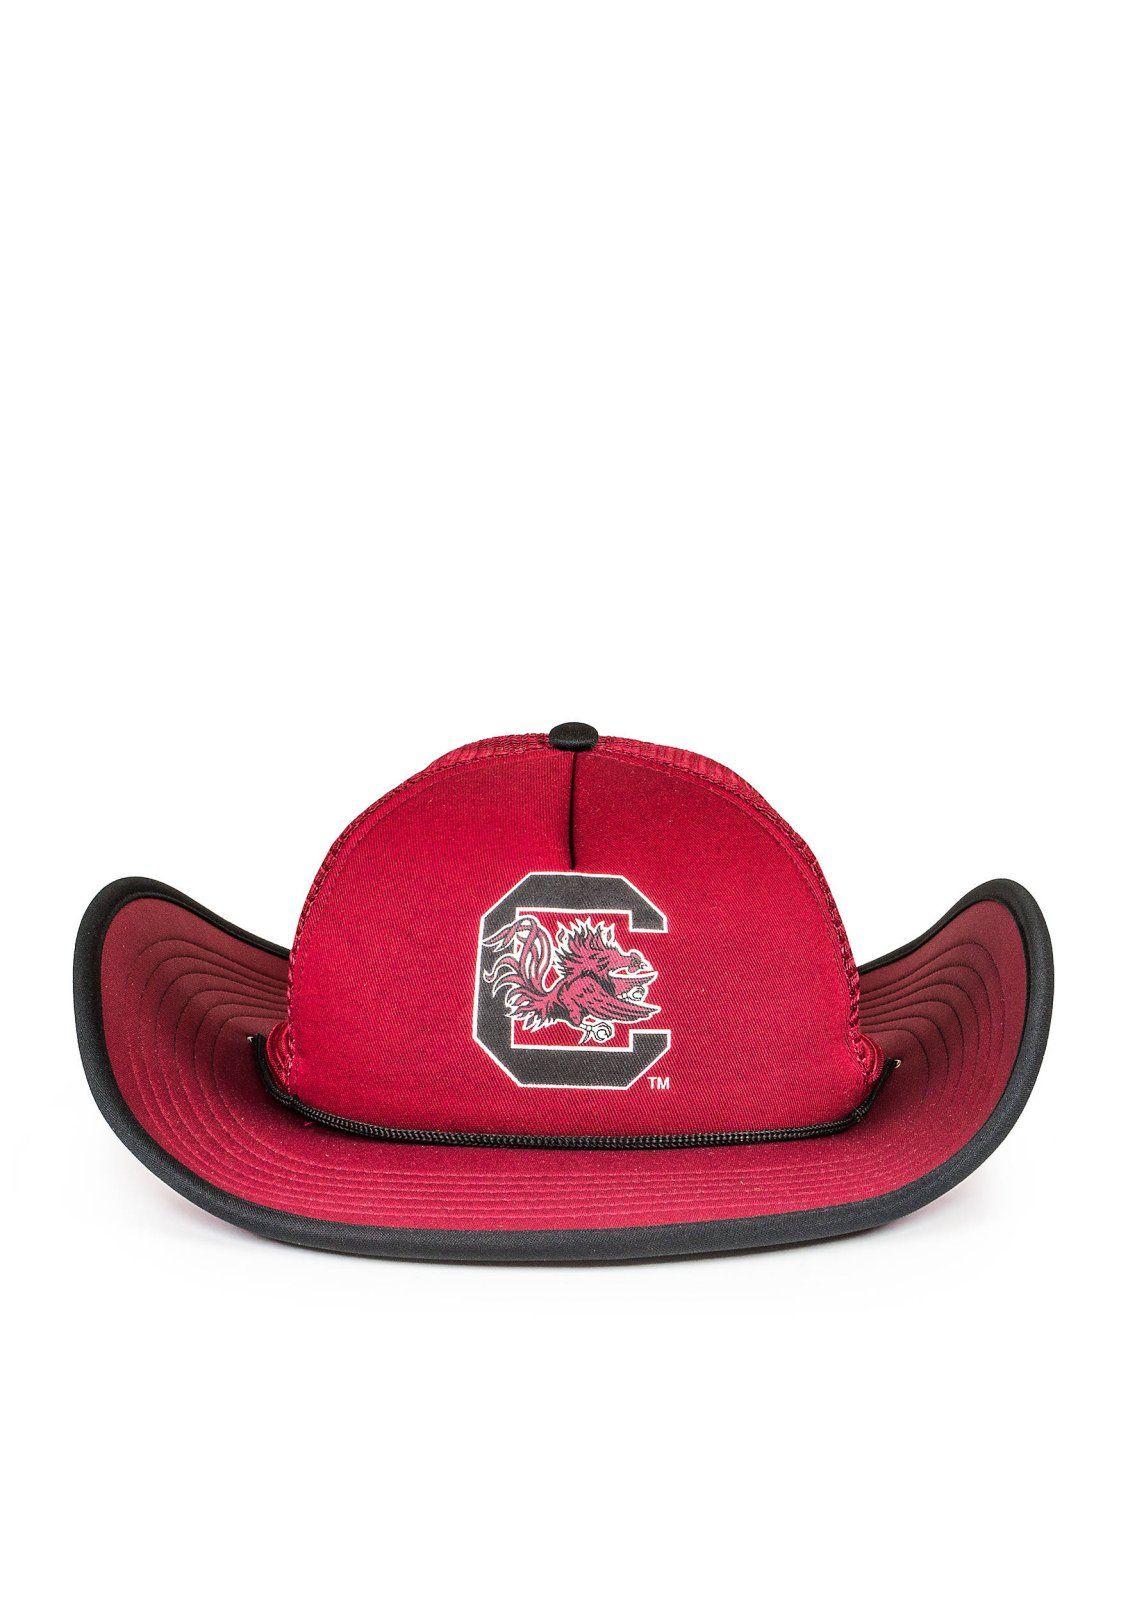 4f57992afc0eb sweden cowbucker south carolina gamecocks spirit mesh bucker hat 1477d 6cb97